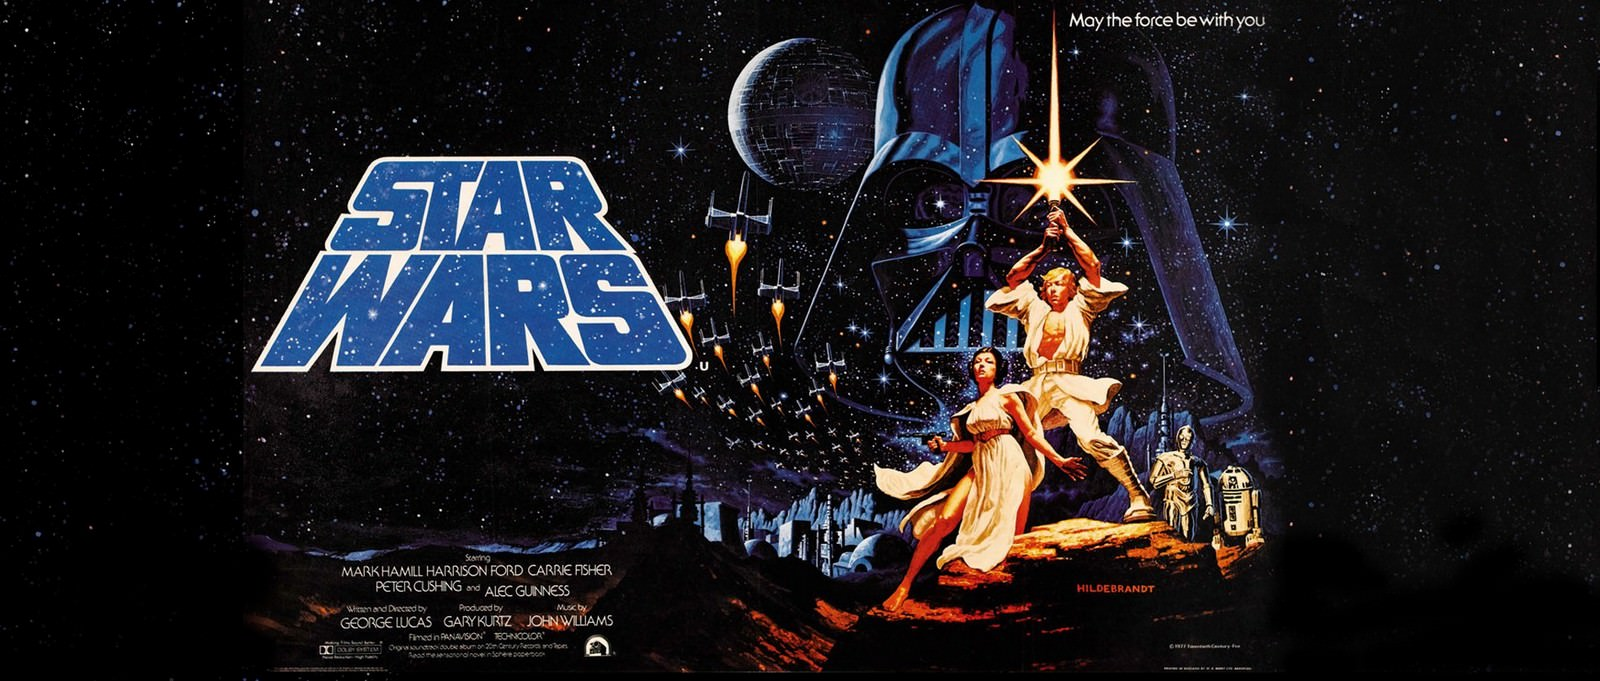 Movie, Star Wars Episode IV: A New Hope(美國, 1977) / 星際大戰四部曲:曙光乍現(台灣) / 星球大战IV:新希望(中國) / 星球大戰:新的希望(香港), 電影海報, 美國, 橫版